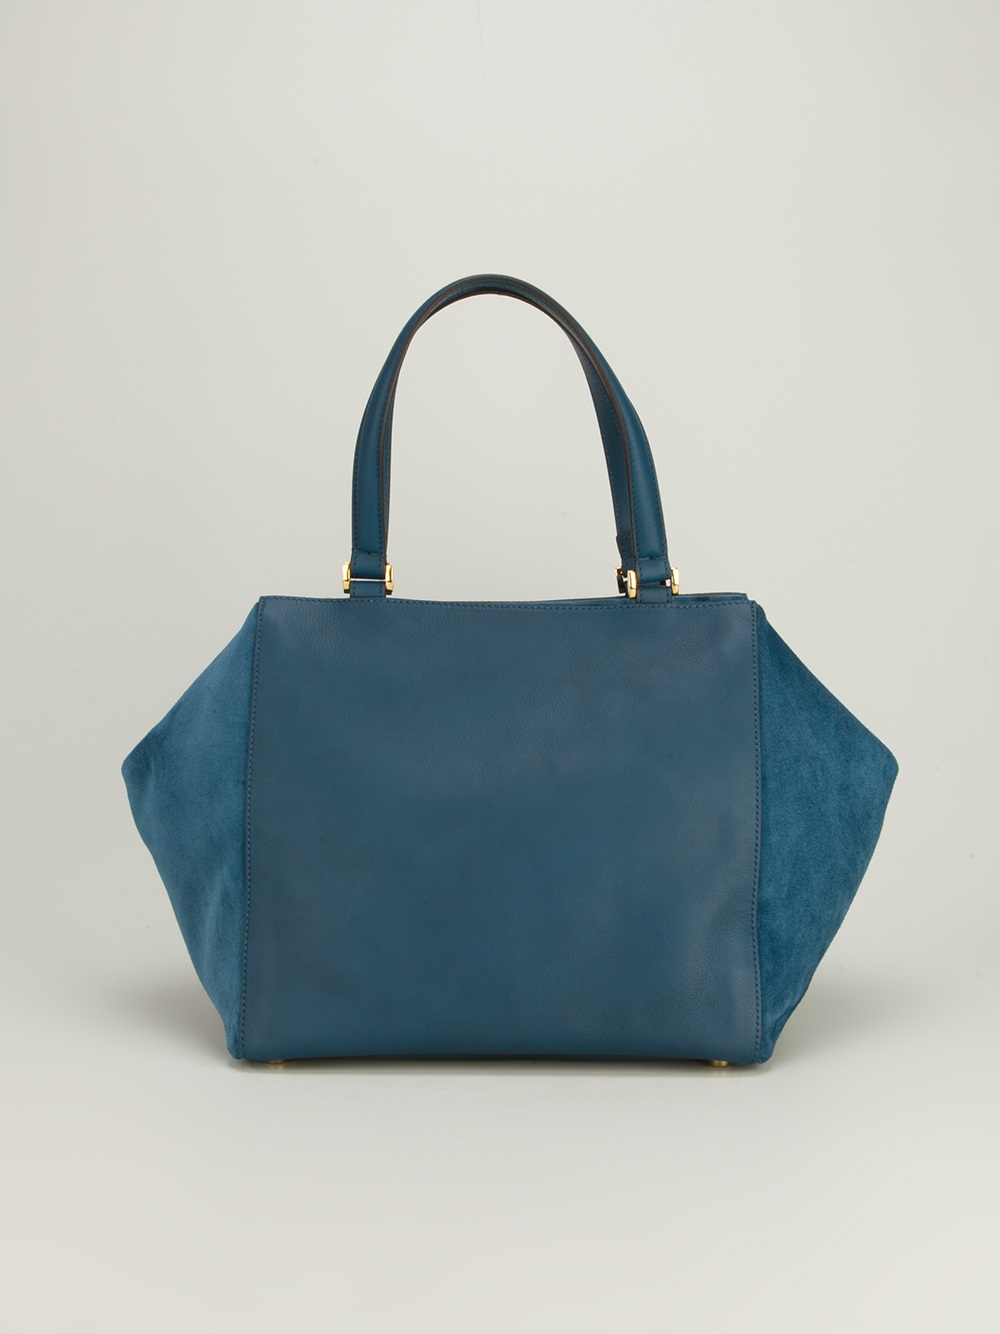 Fendi Square Tote Bag in Blue